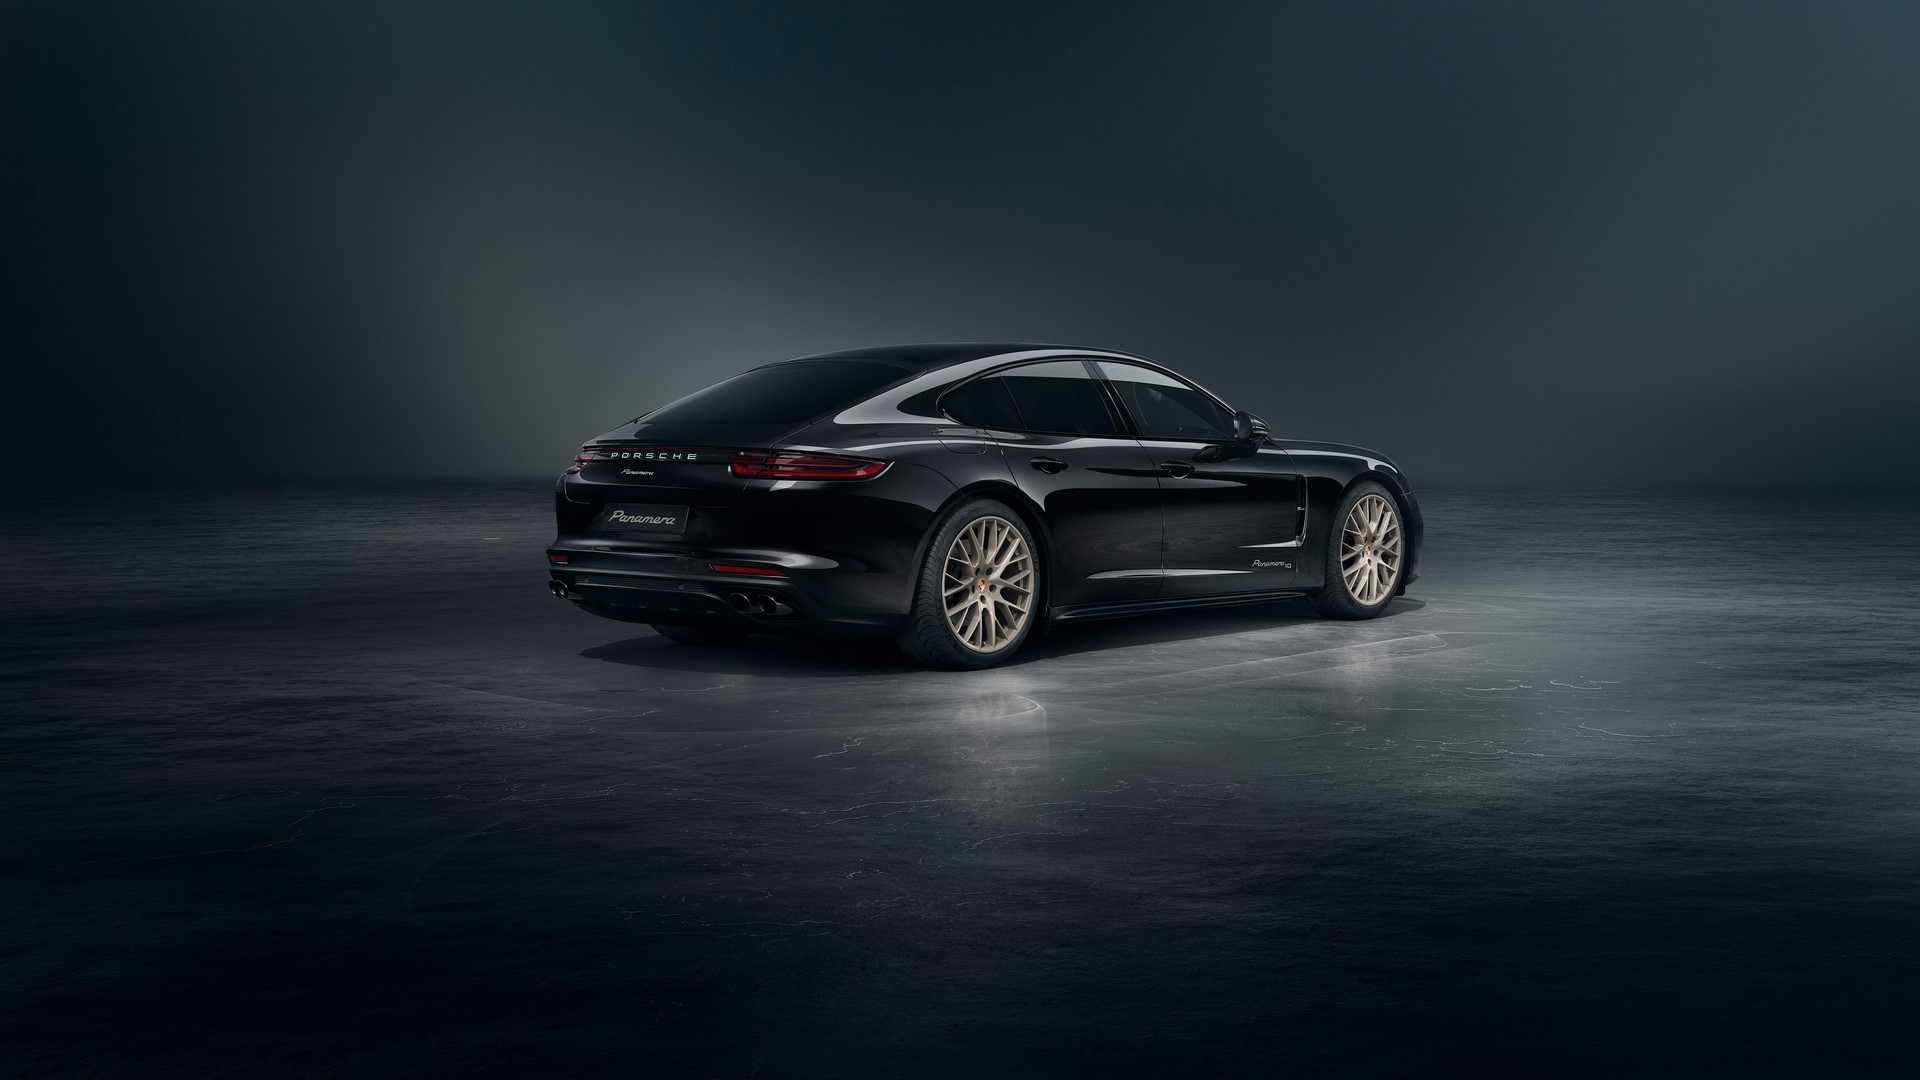 Porsche-Panamera-10-Years-Edition-2